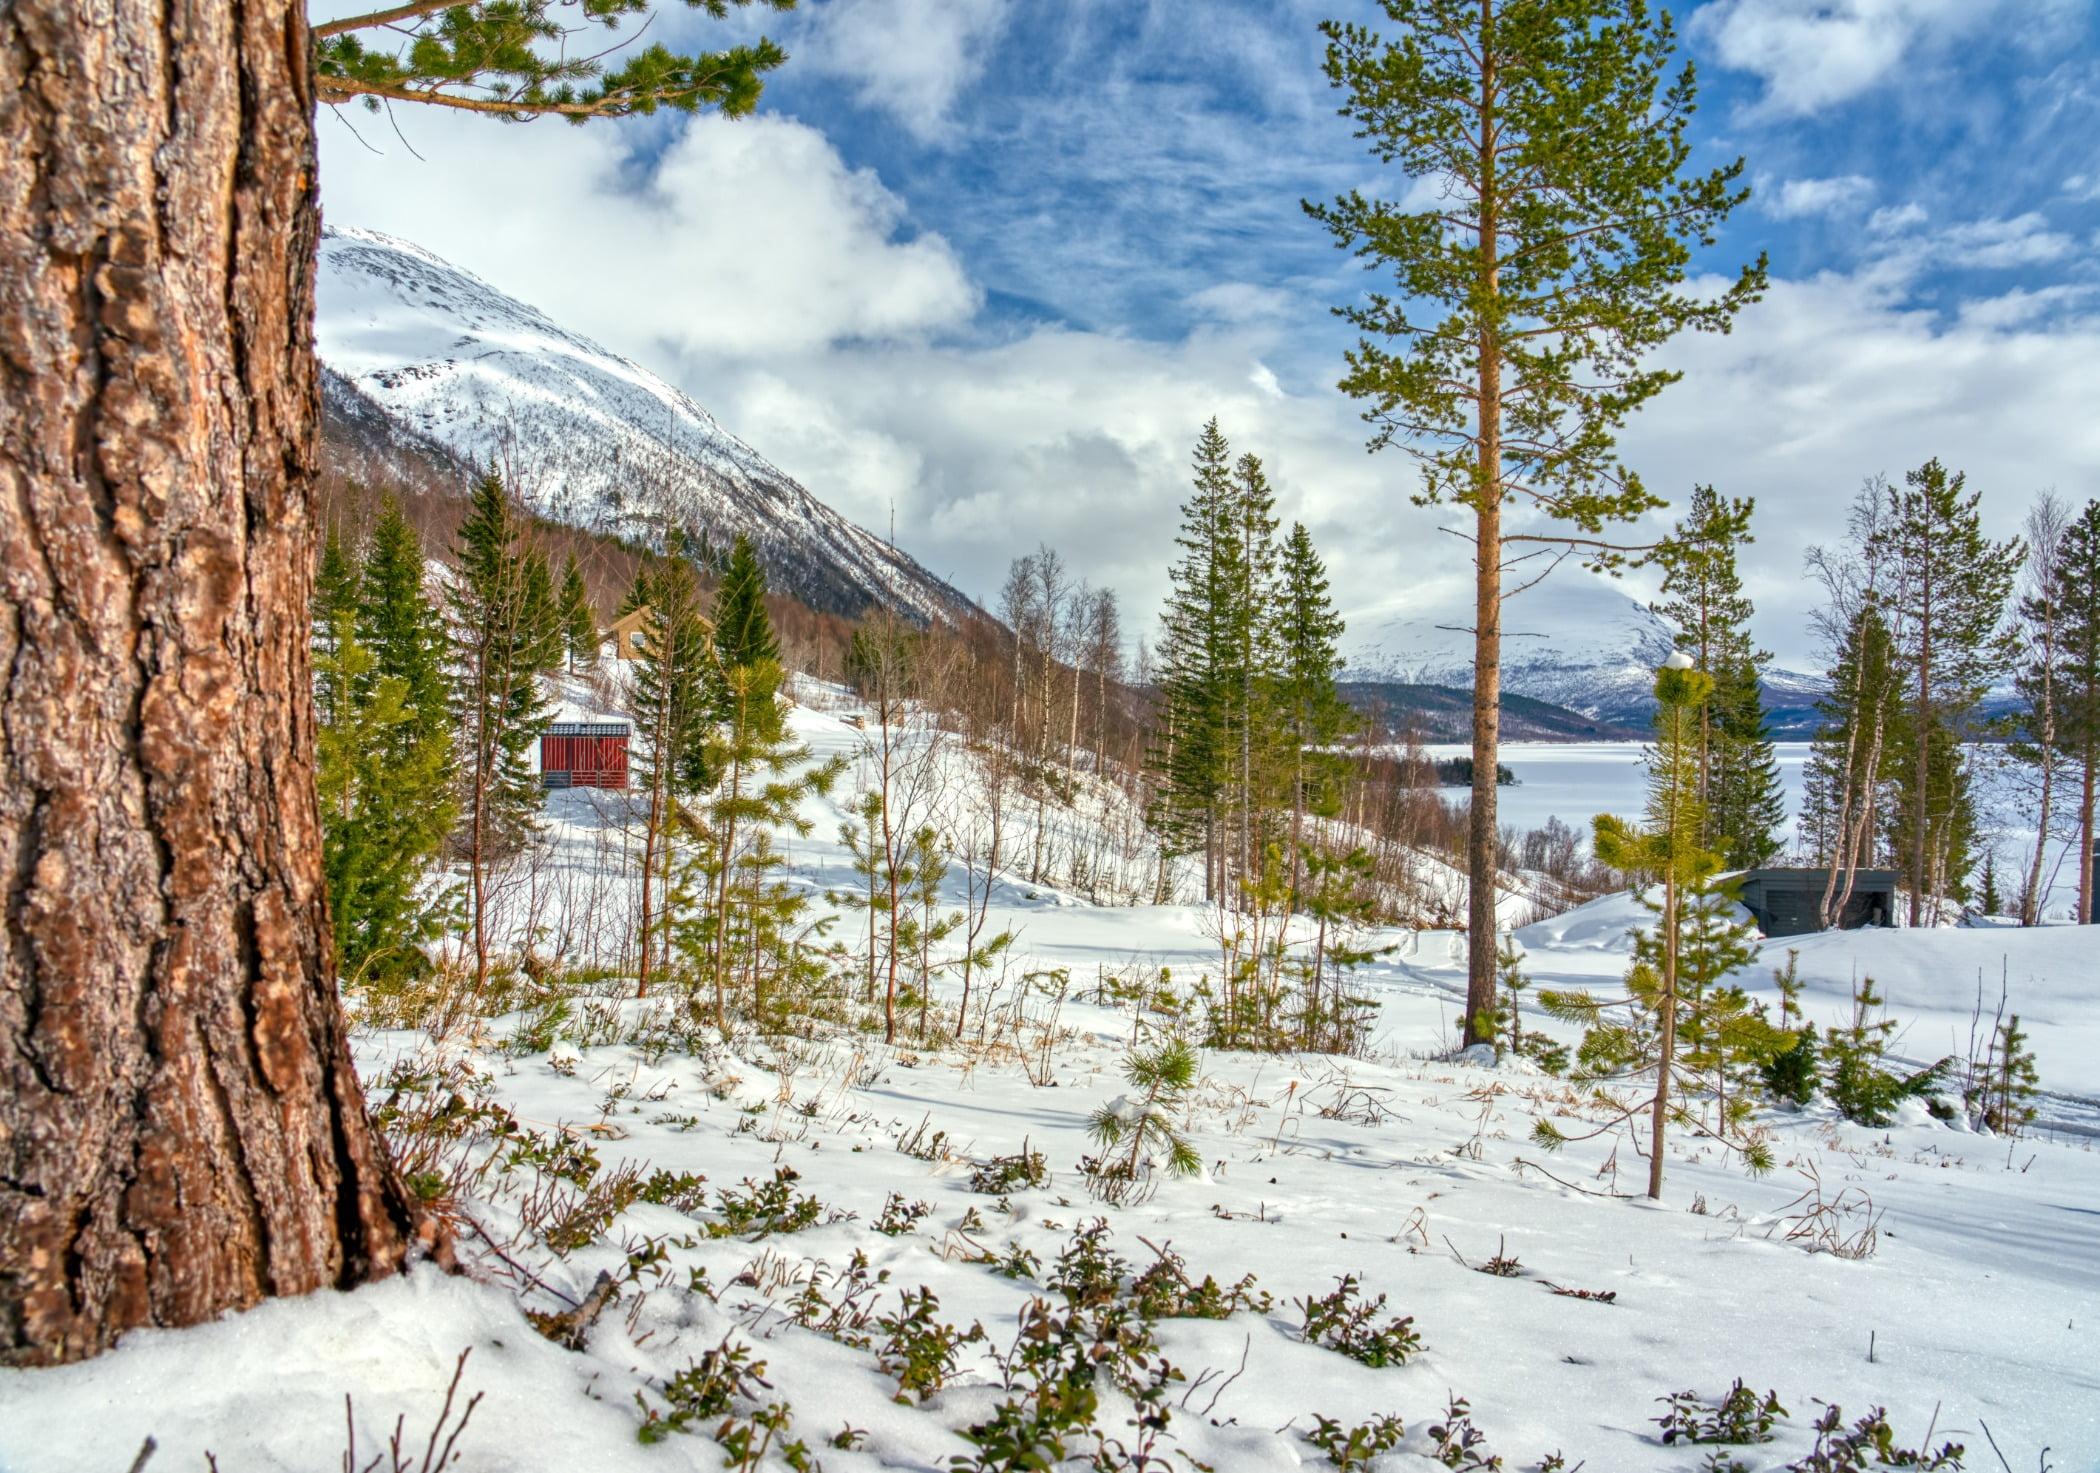 Natural landscape, Cloud, Plant, Sky, Snow, Nature, Larch, Tree, Slope, Wood